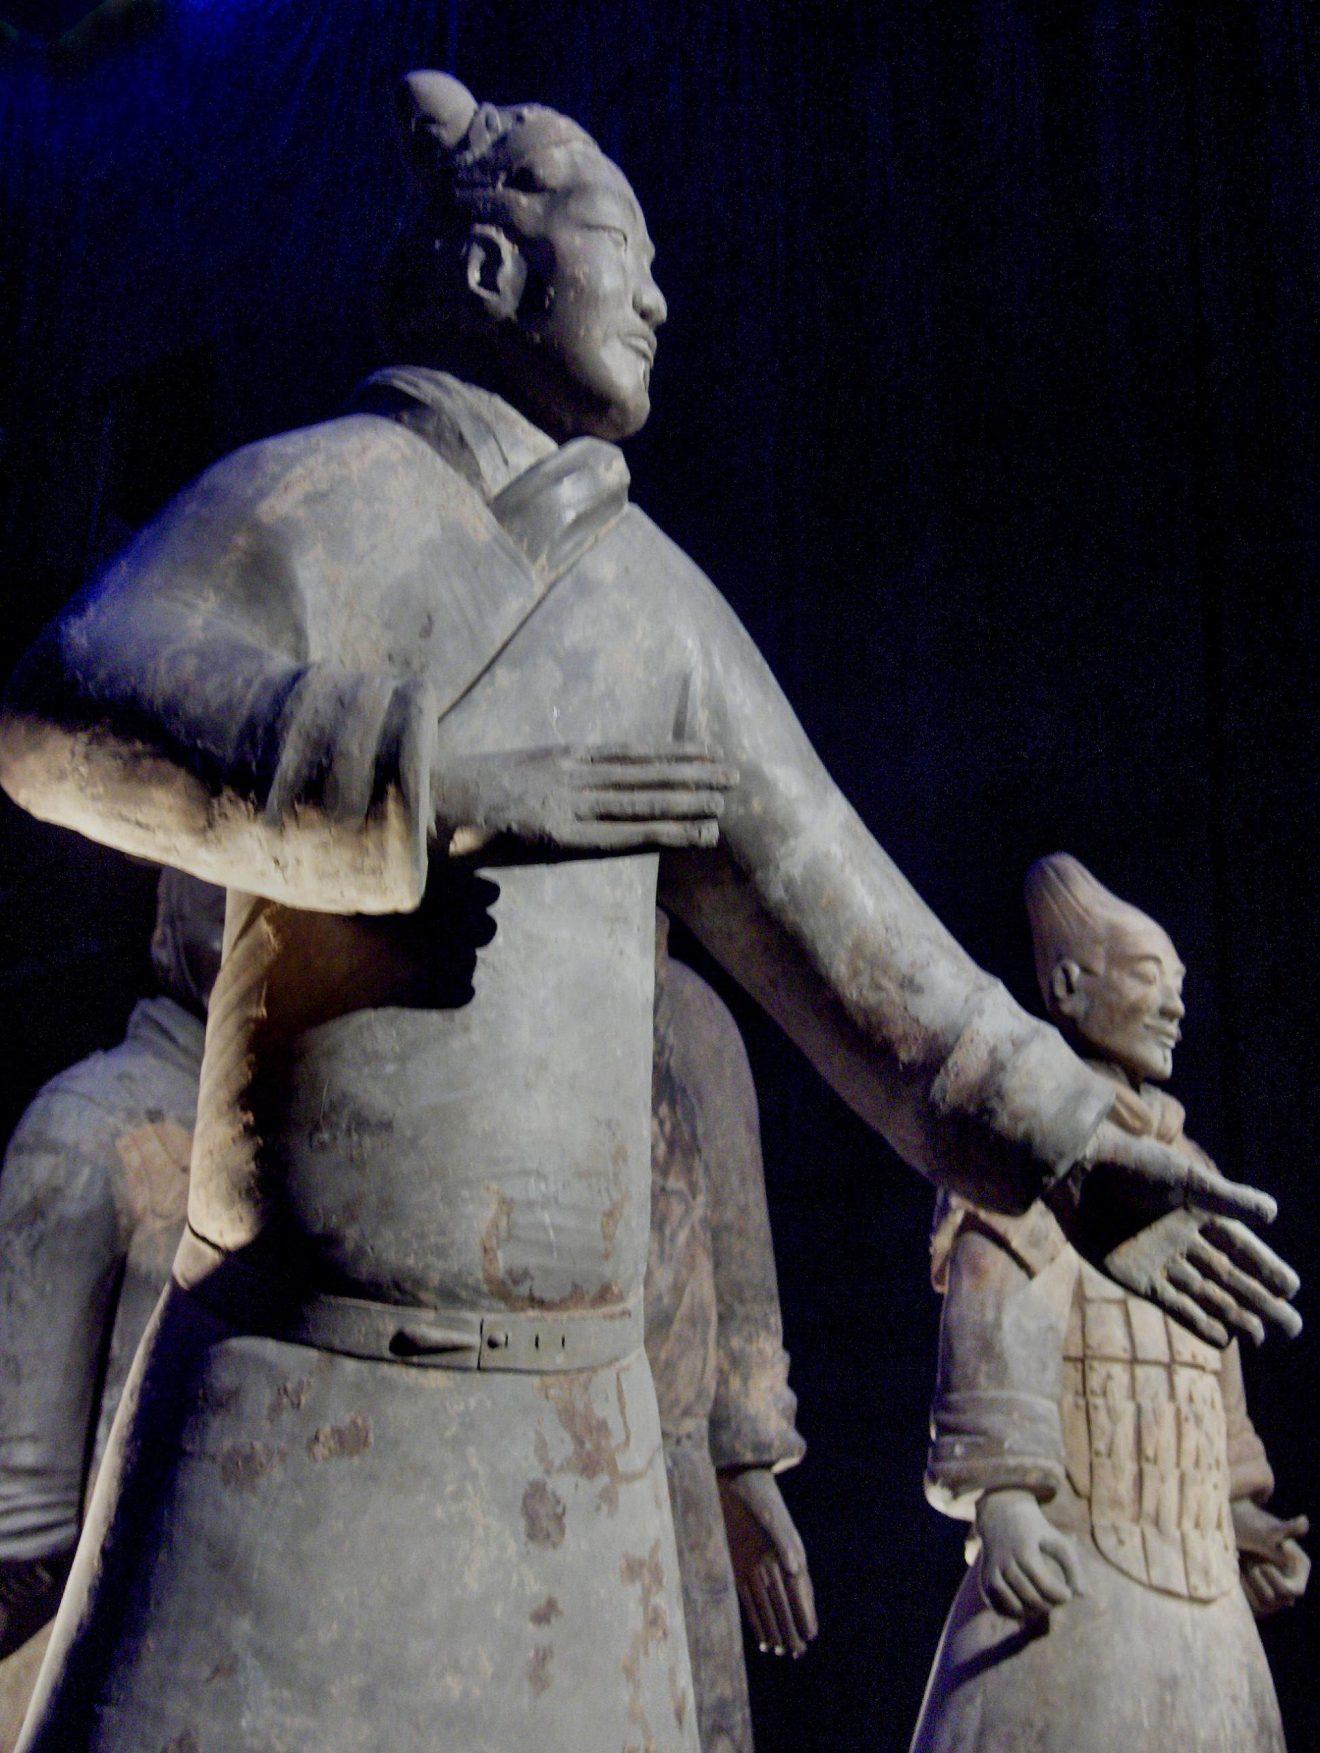 Soldat de terre cuite du tombeau de Qin Shi Huang